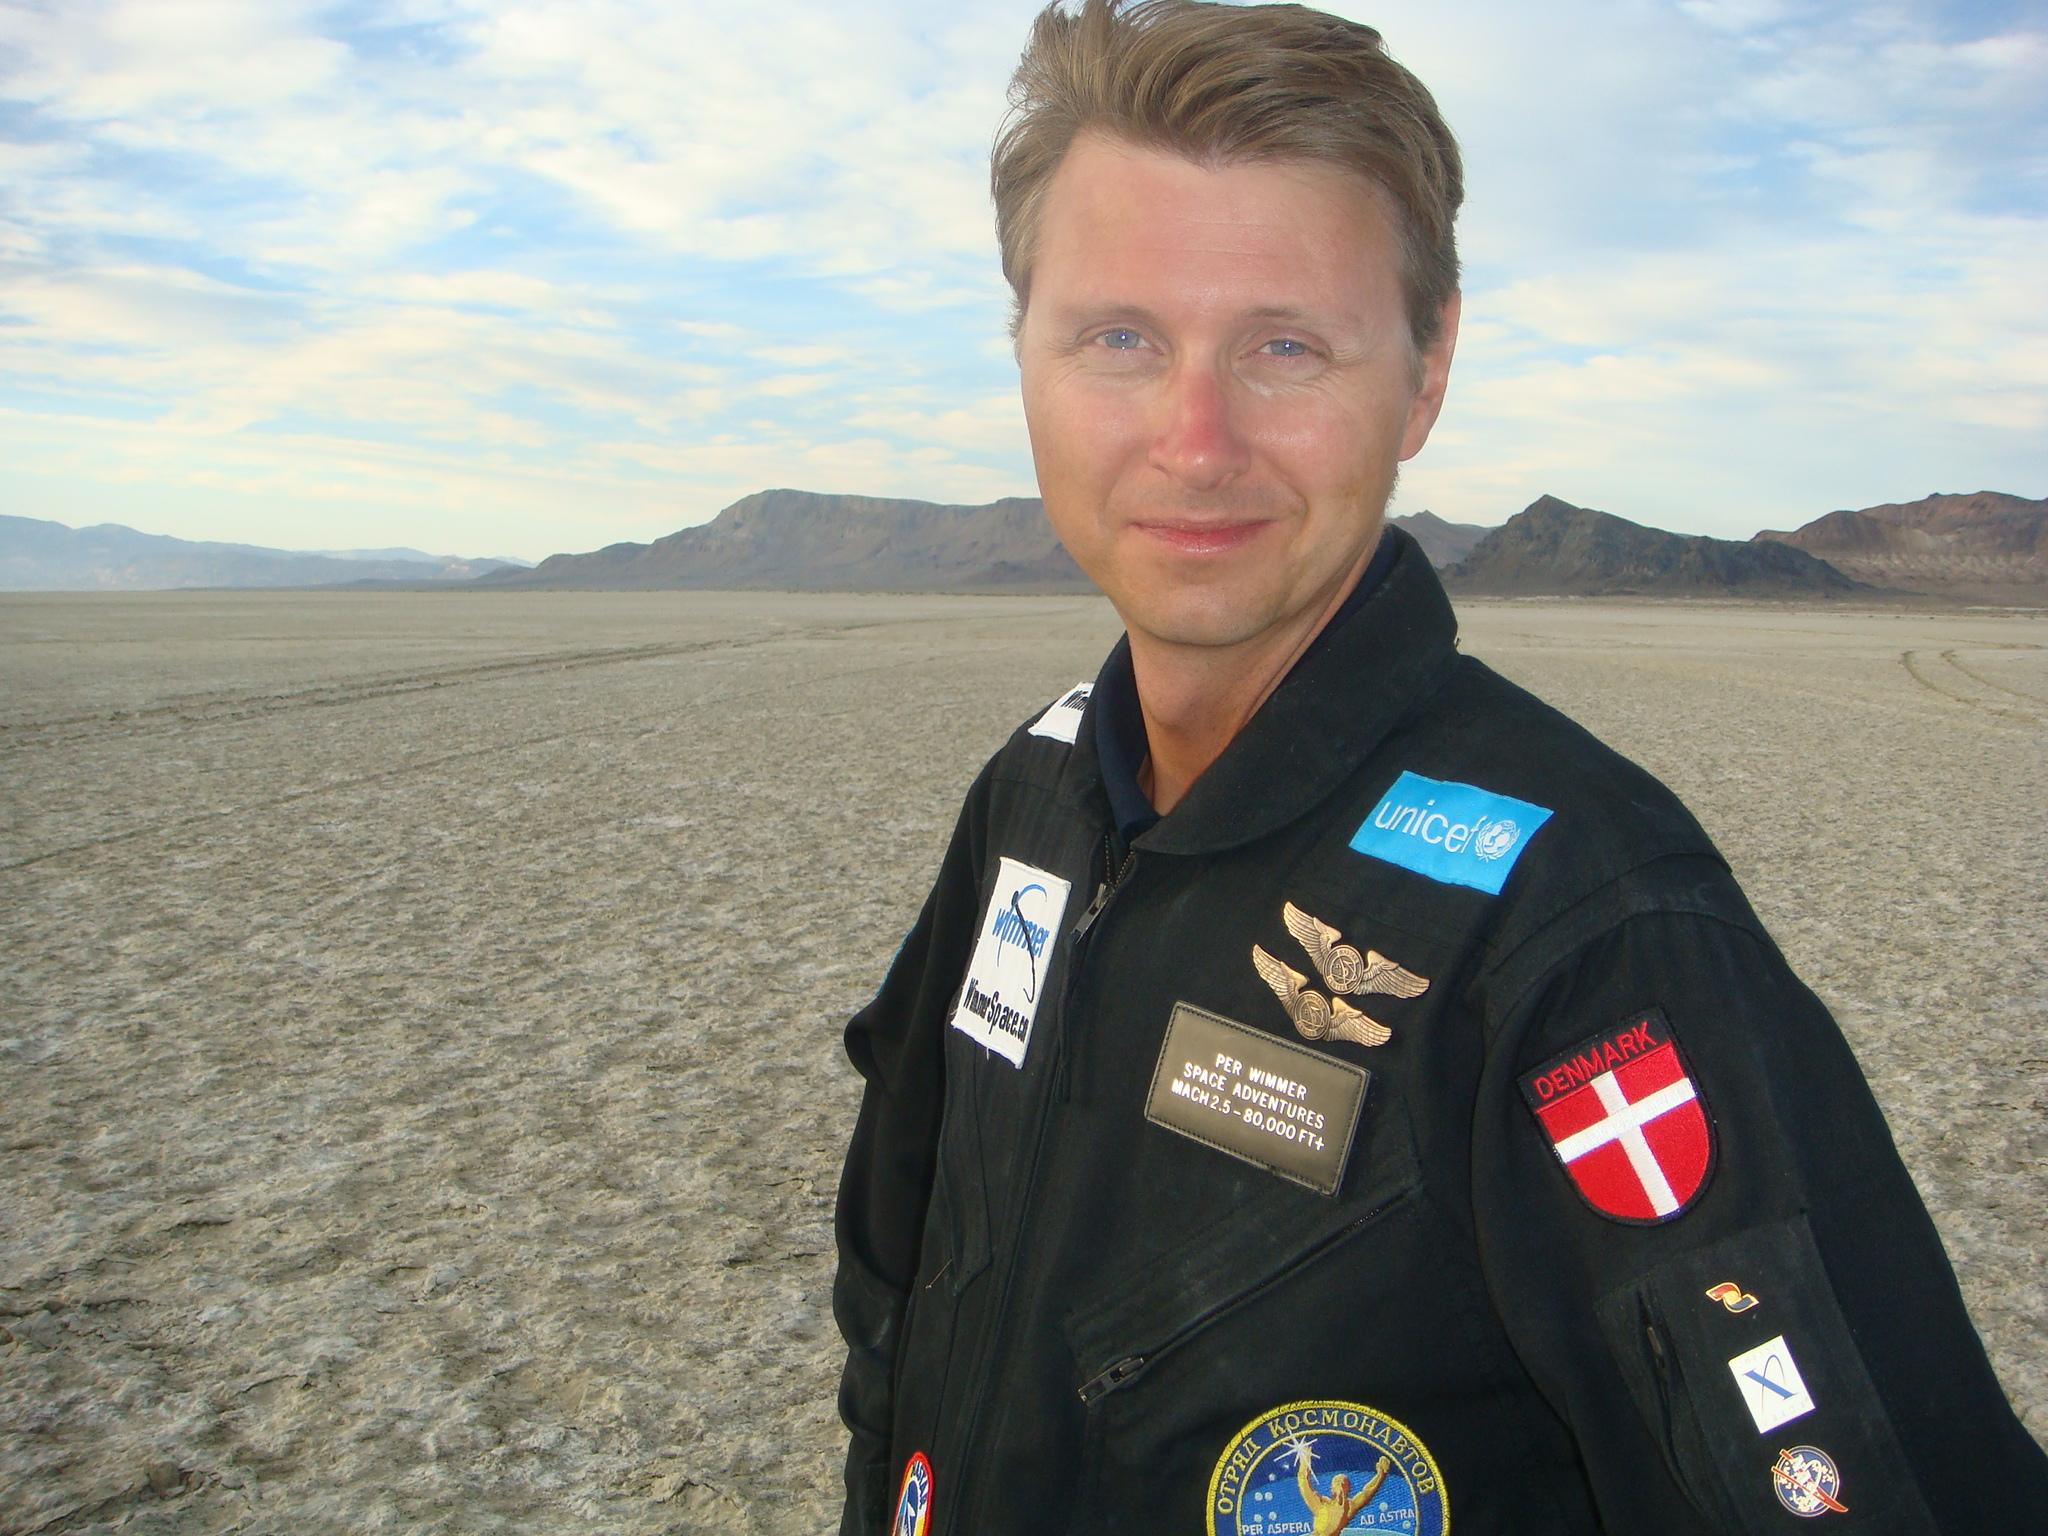 How Do You Train to Become a Space Tourist?